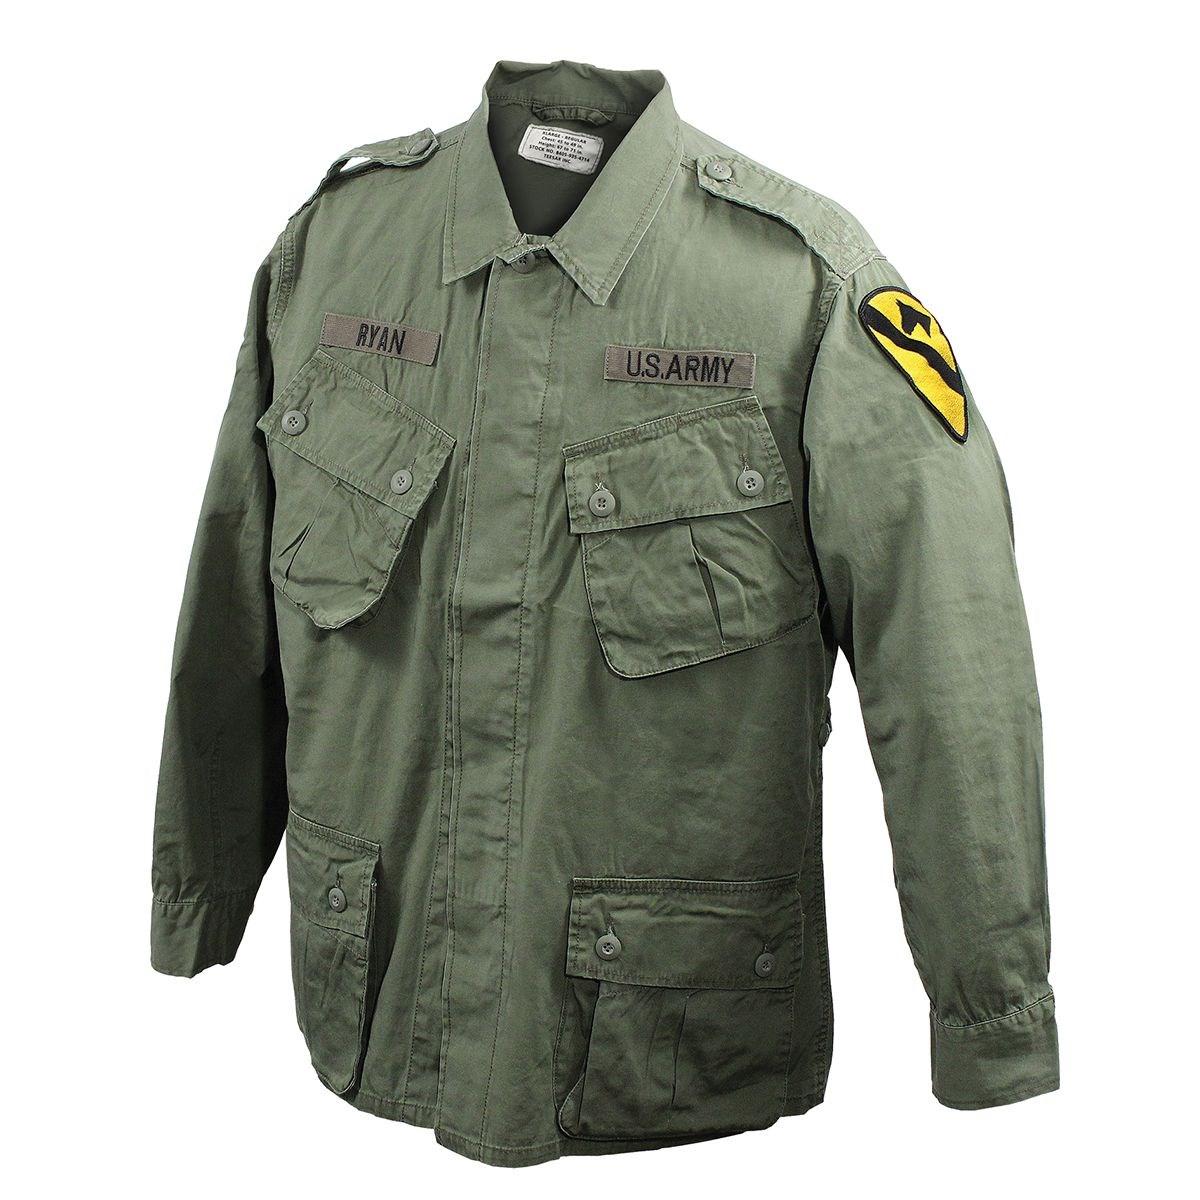 Blůza M64 VIETNAM šikmé kapsy ZELENÁ TEESAR® 11997001 L-11